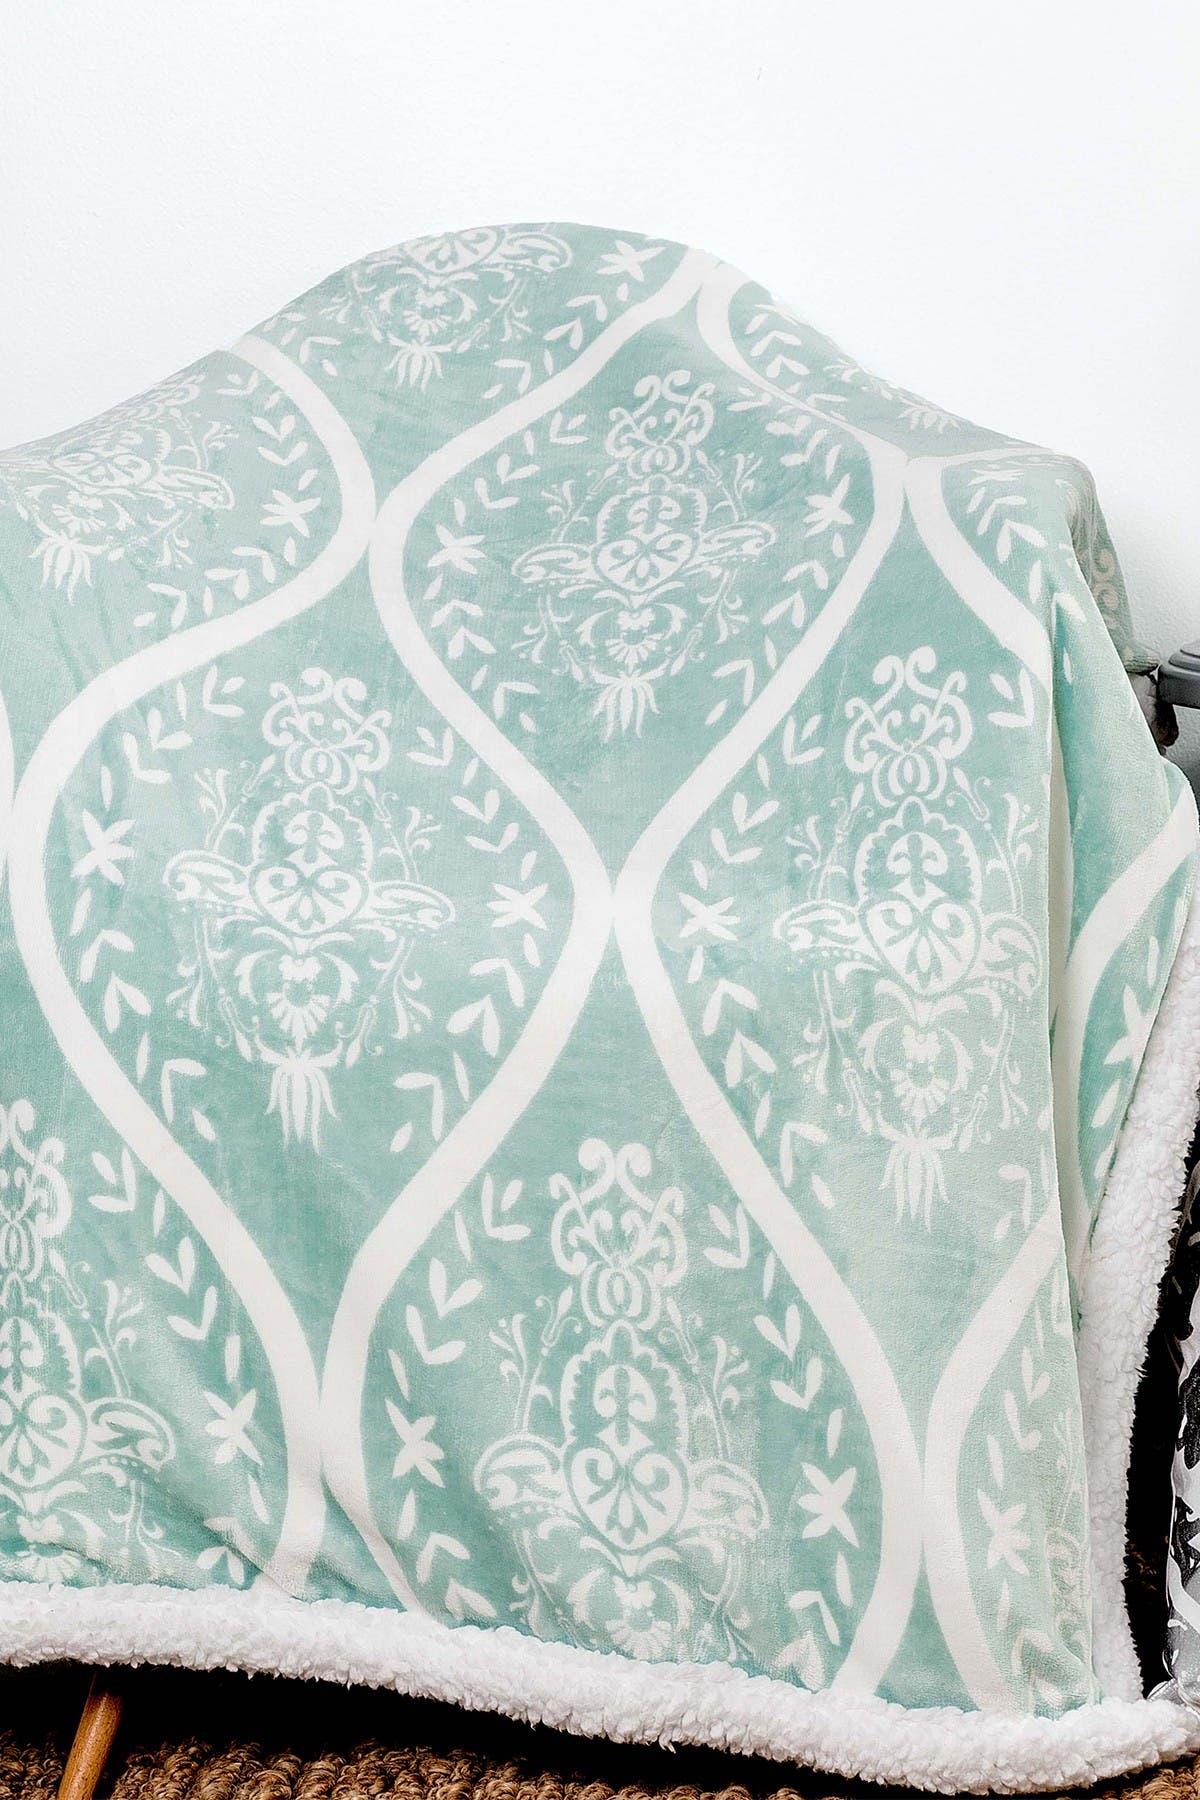 Image of Duck River Textile Kerchner Fleece Throw - Cool Mist